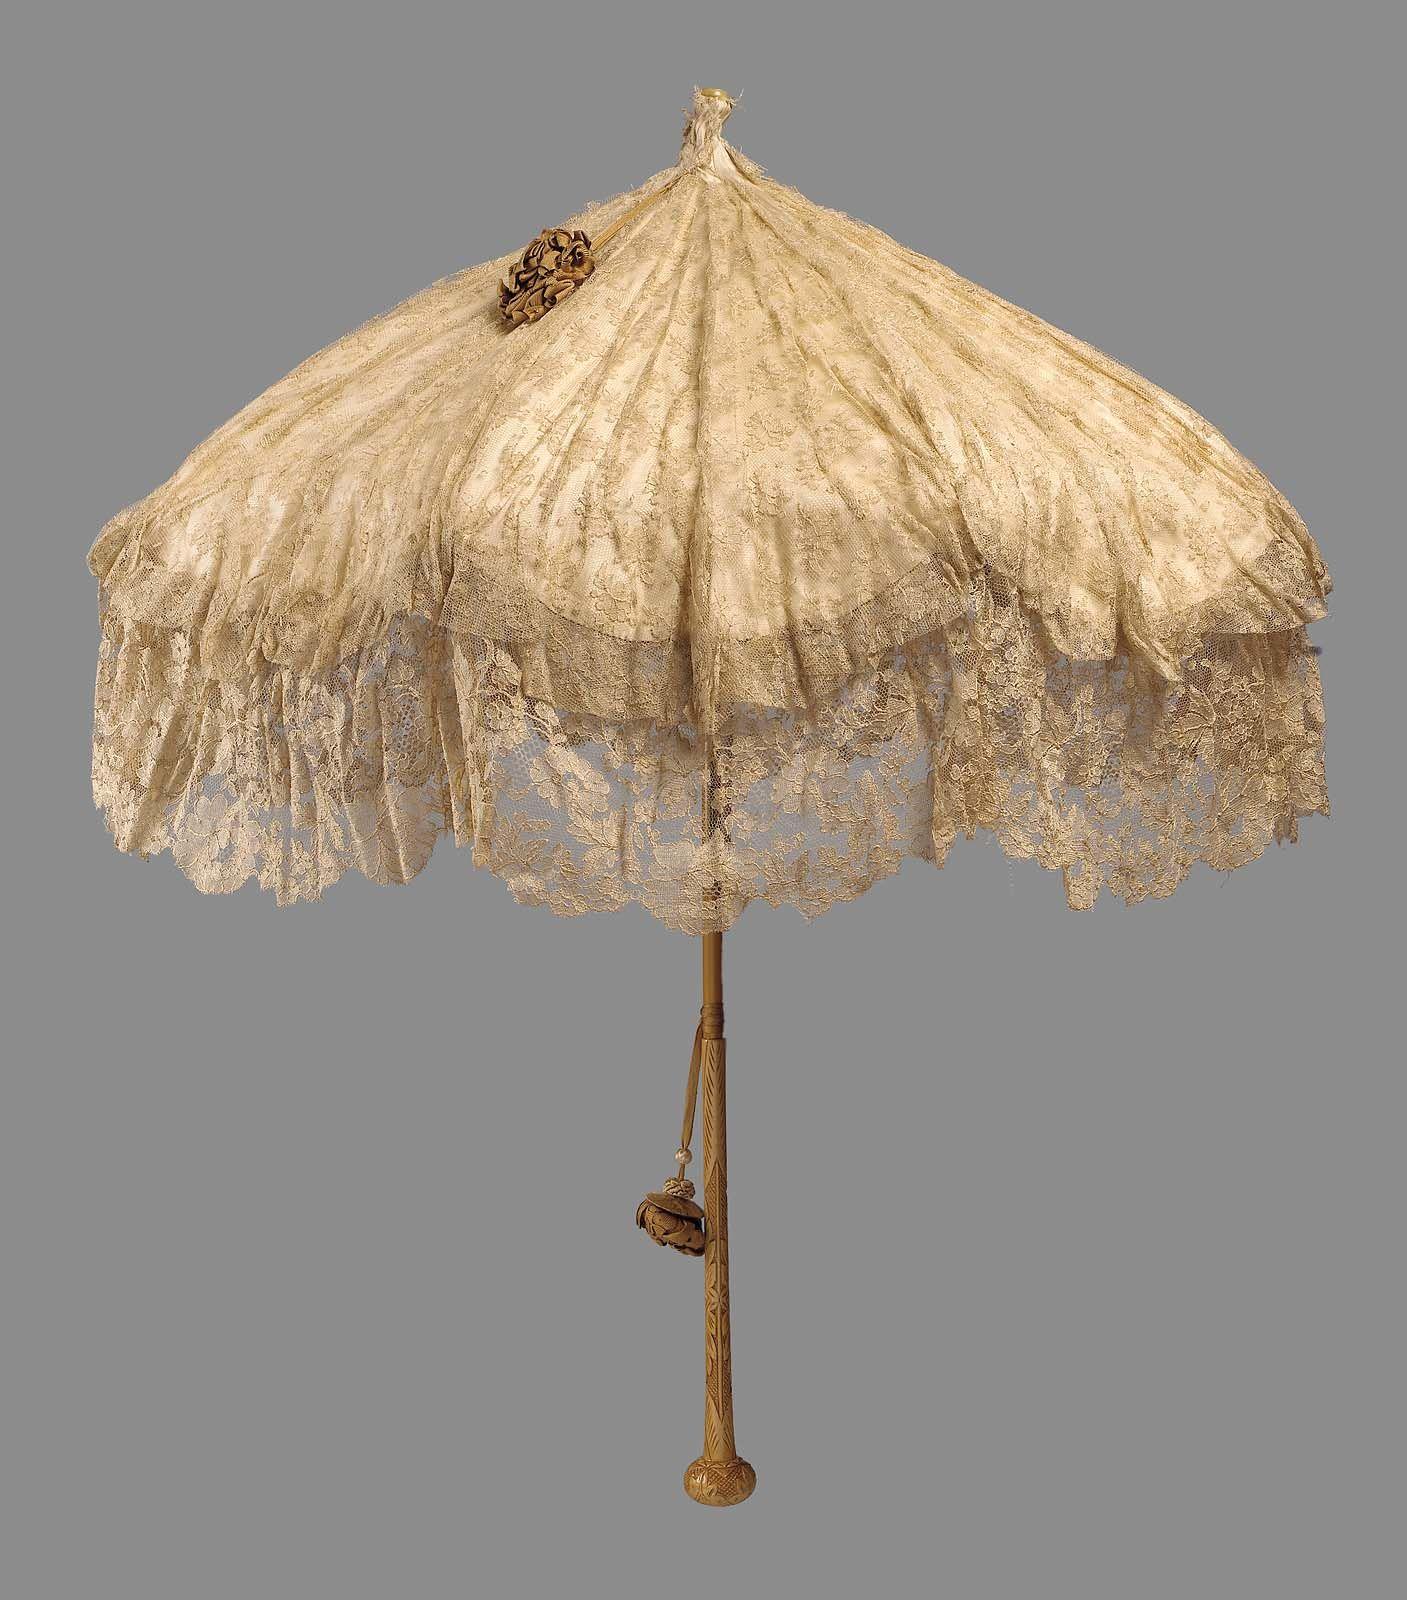 Parasol Museum Of Fine Arts Boston Parasol Vintage Umbrella Lace Umbrella